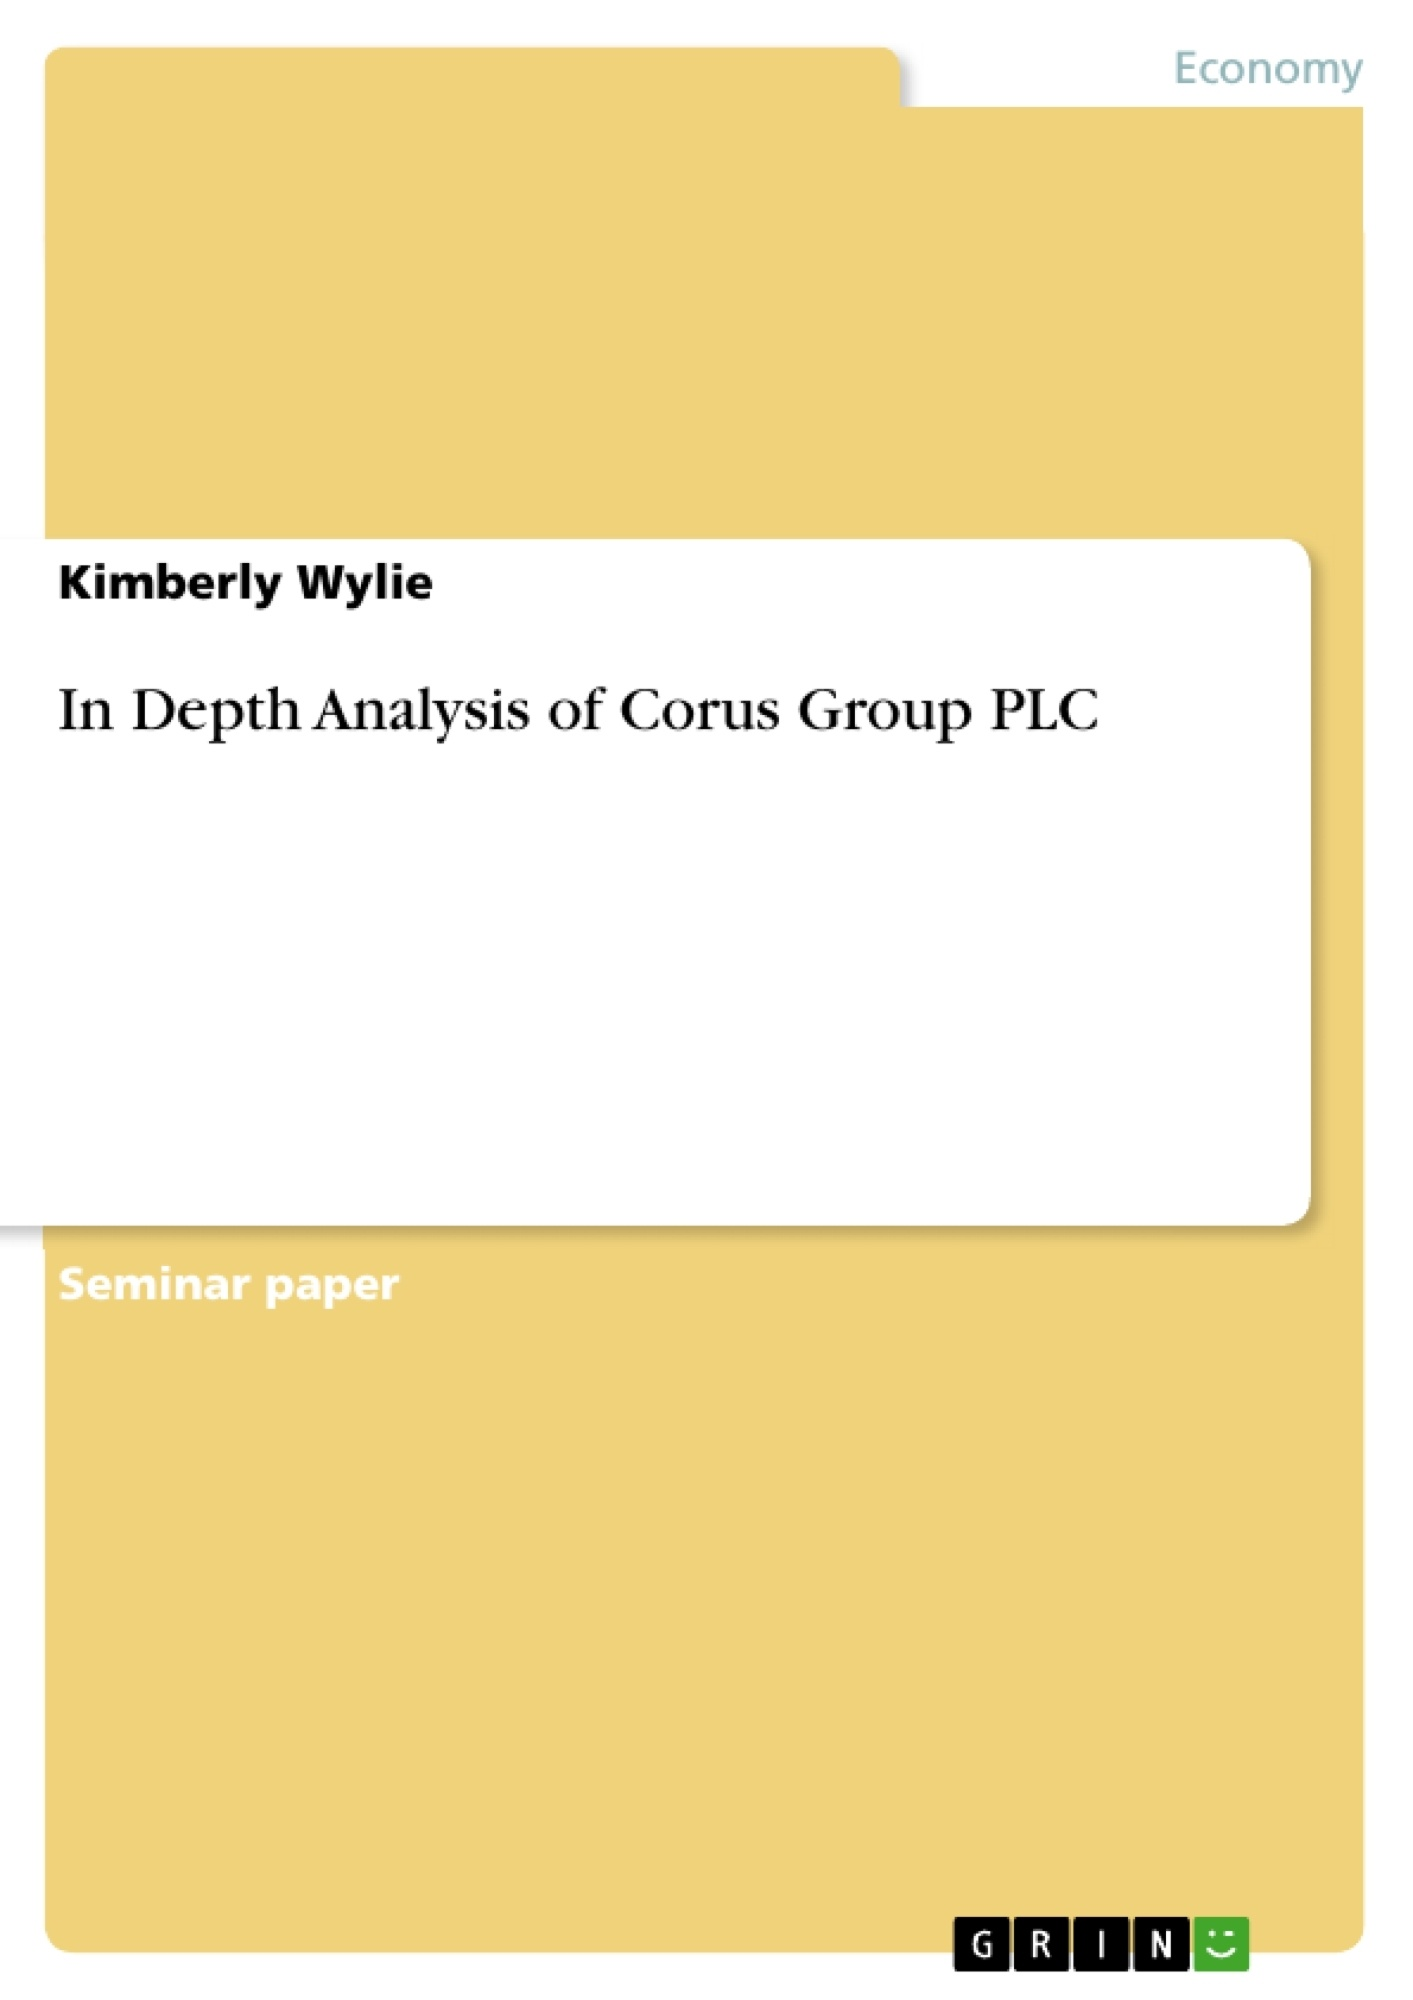 Title: In Depth Analysis of Corus Group PLC